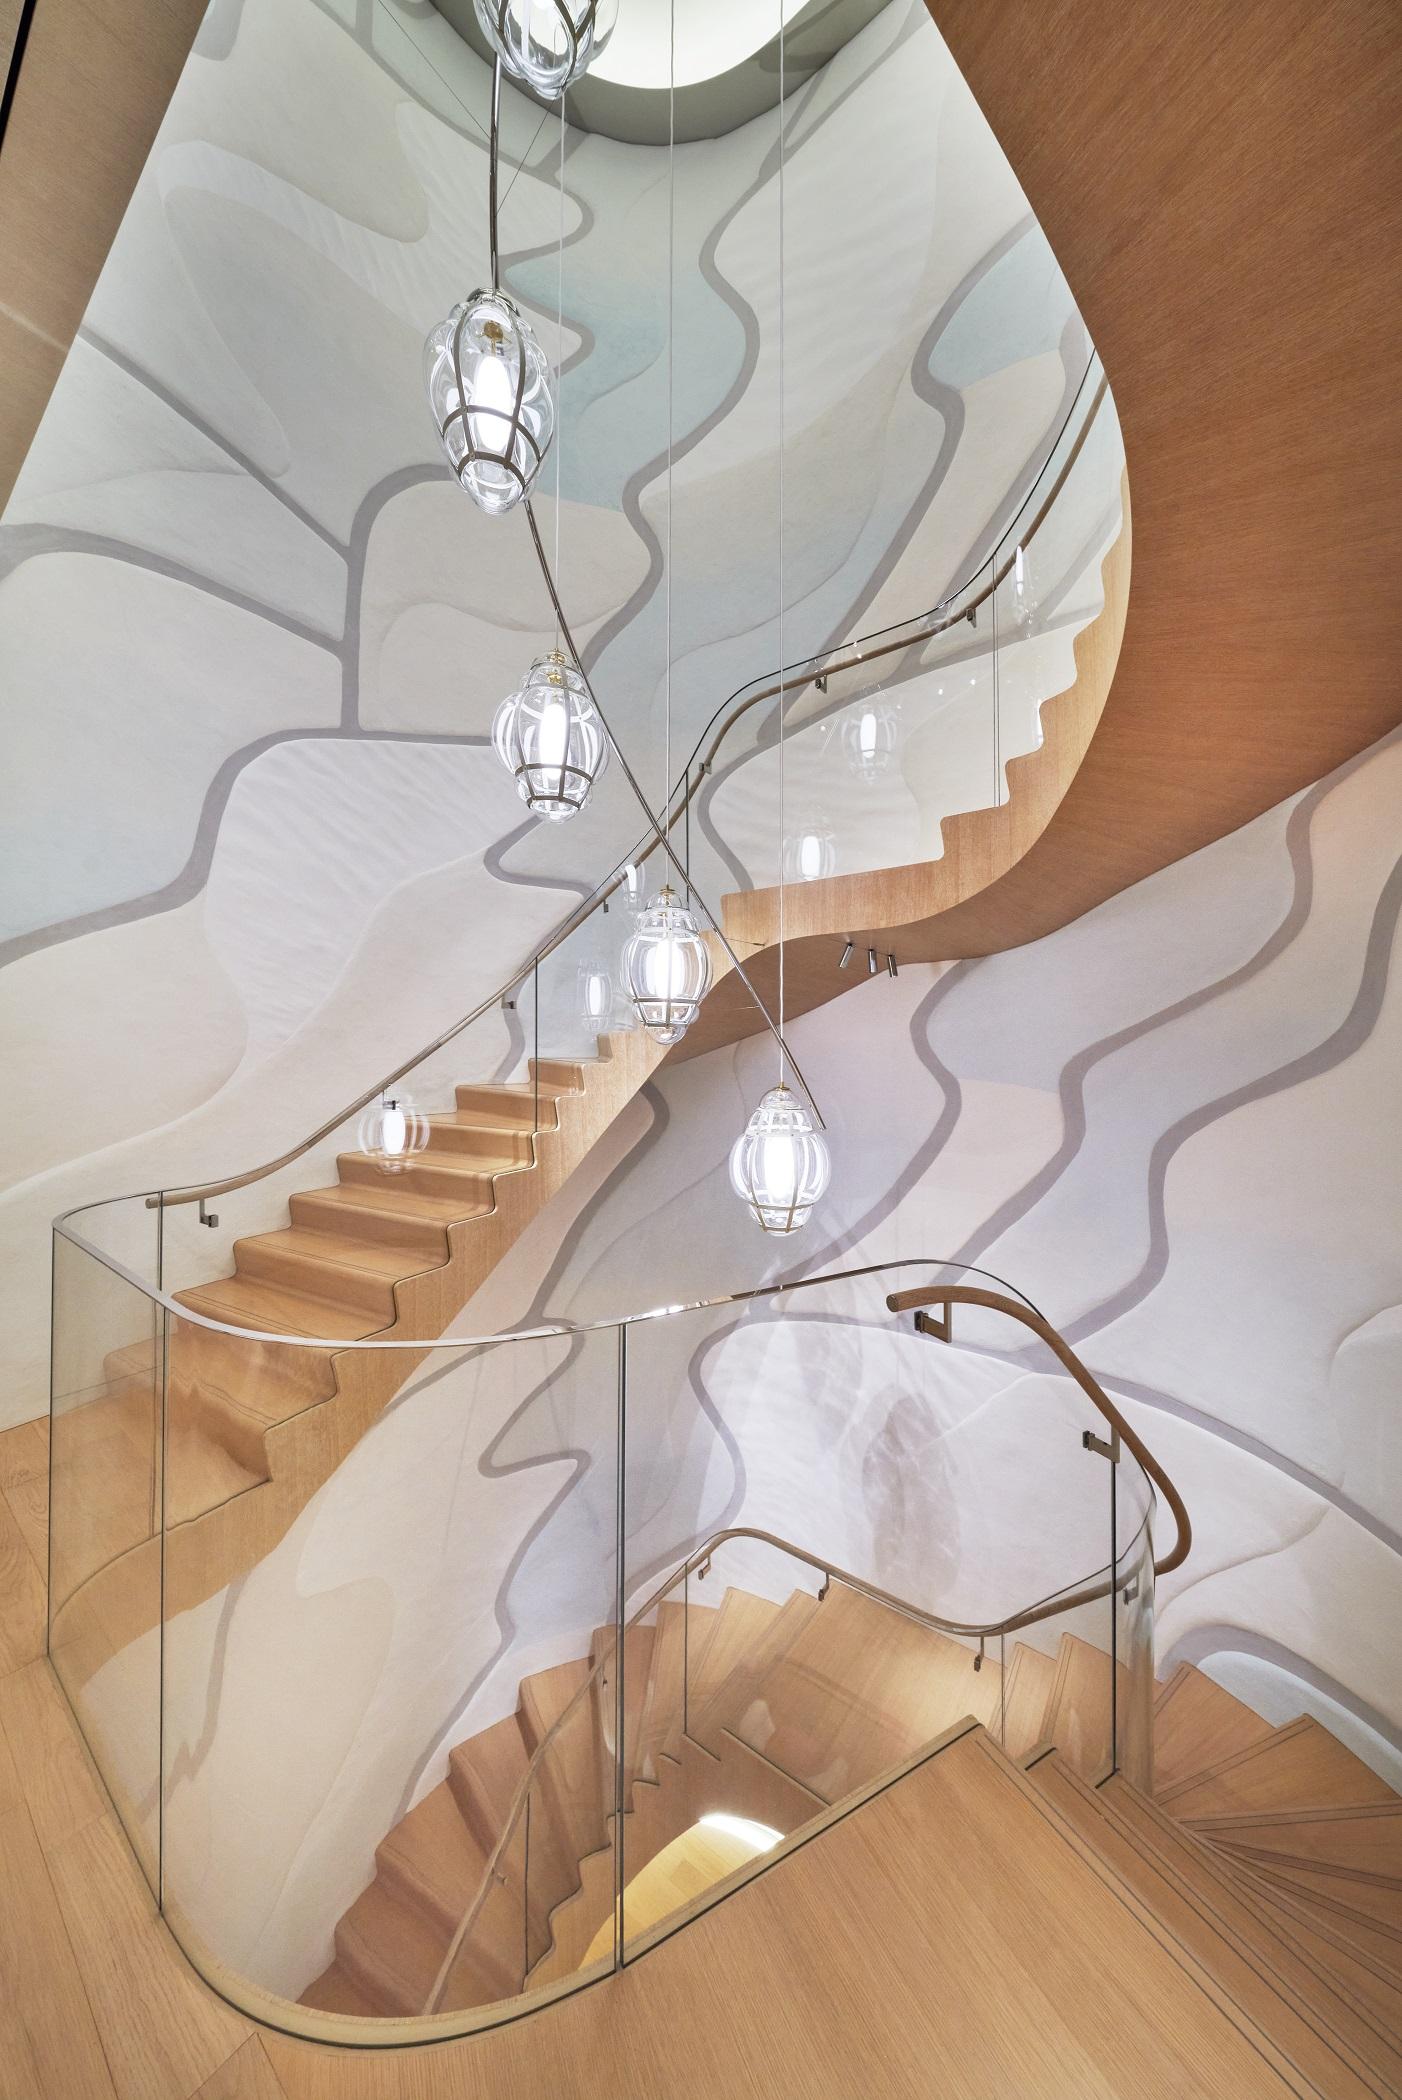 Louis Vuitton Ginza Namiki by Daici Ano (2)